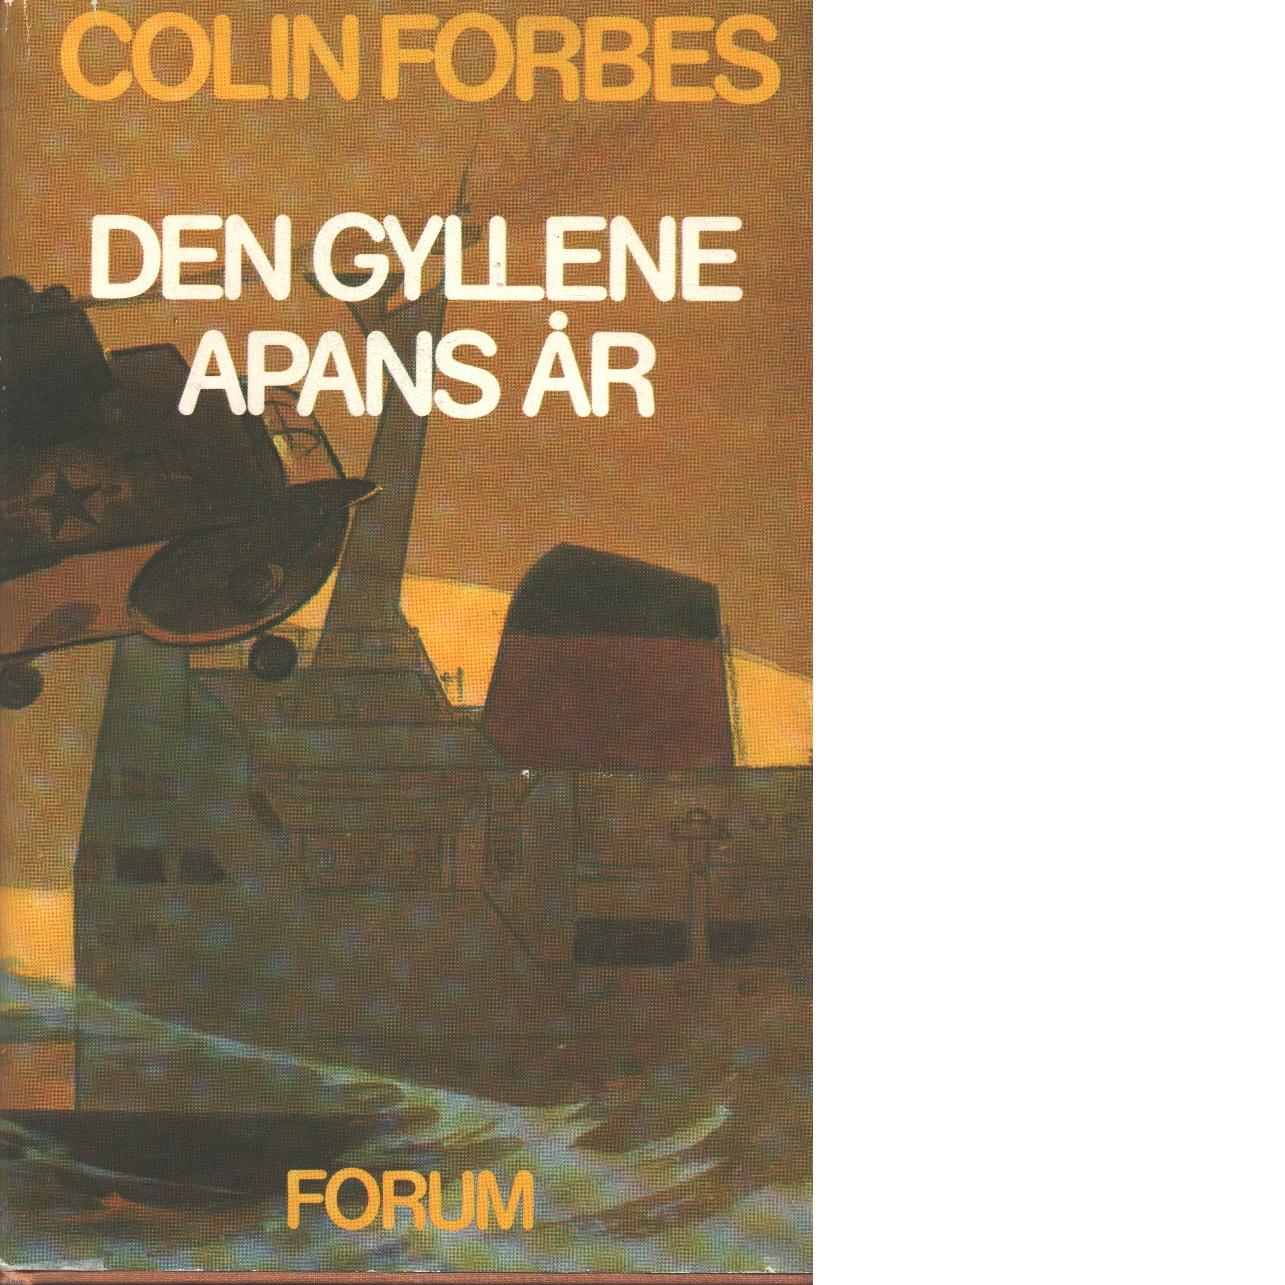 Den gyllene apans år - Forbes, Colin